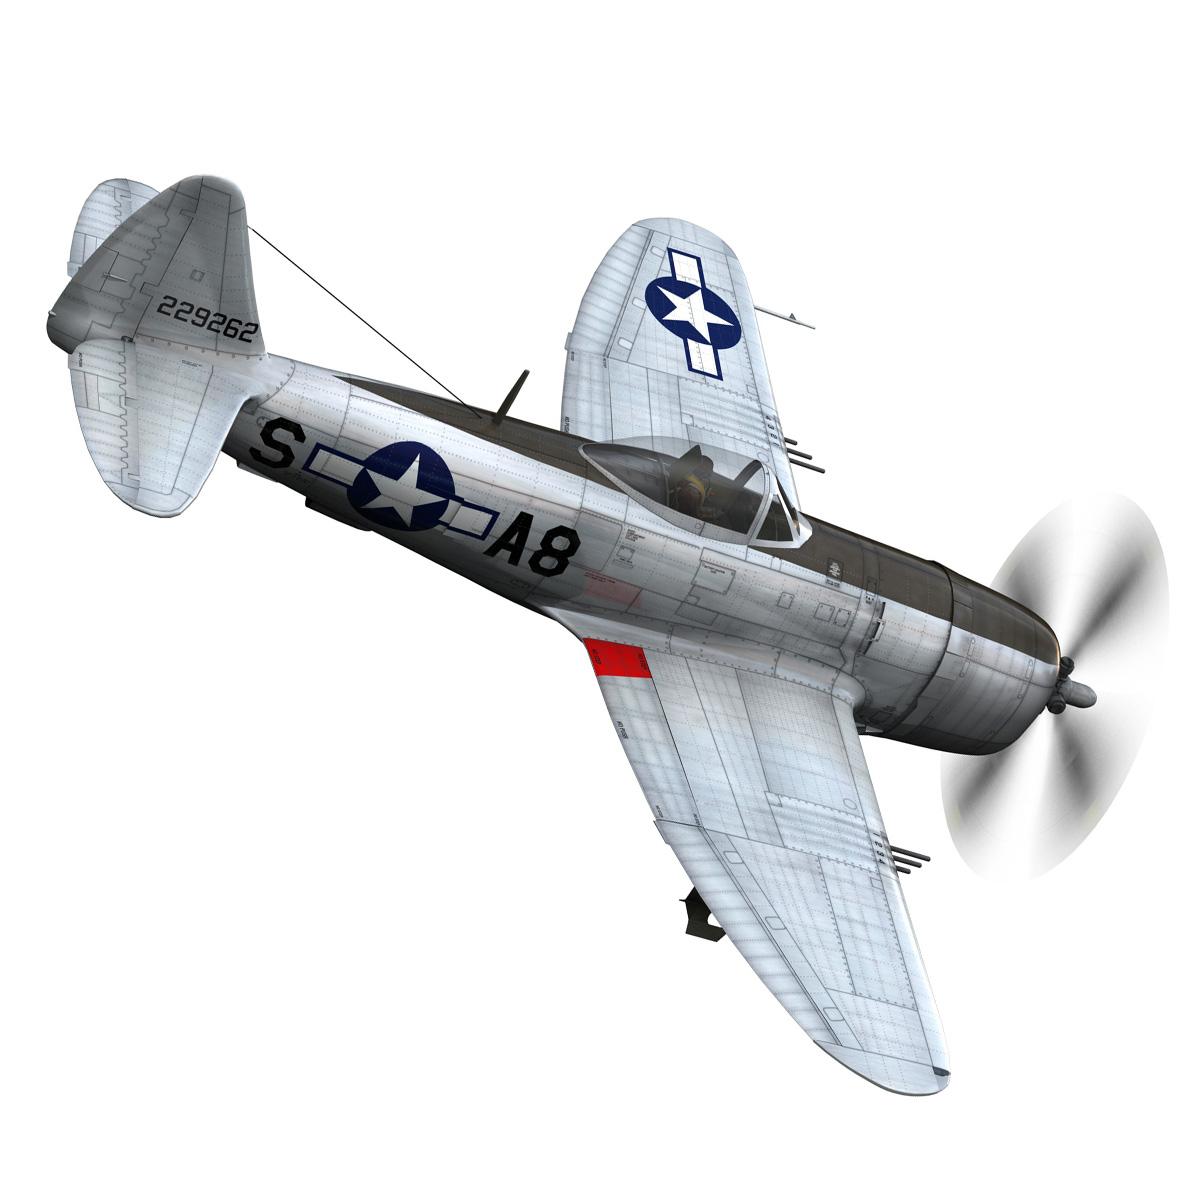 republic p-47 thunderbolt – daddy rabbit 3d model fbx c4d lwo obj 272694